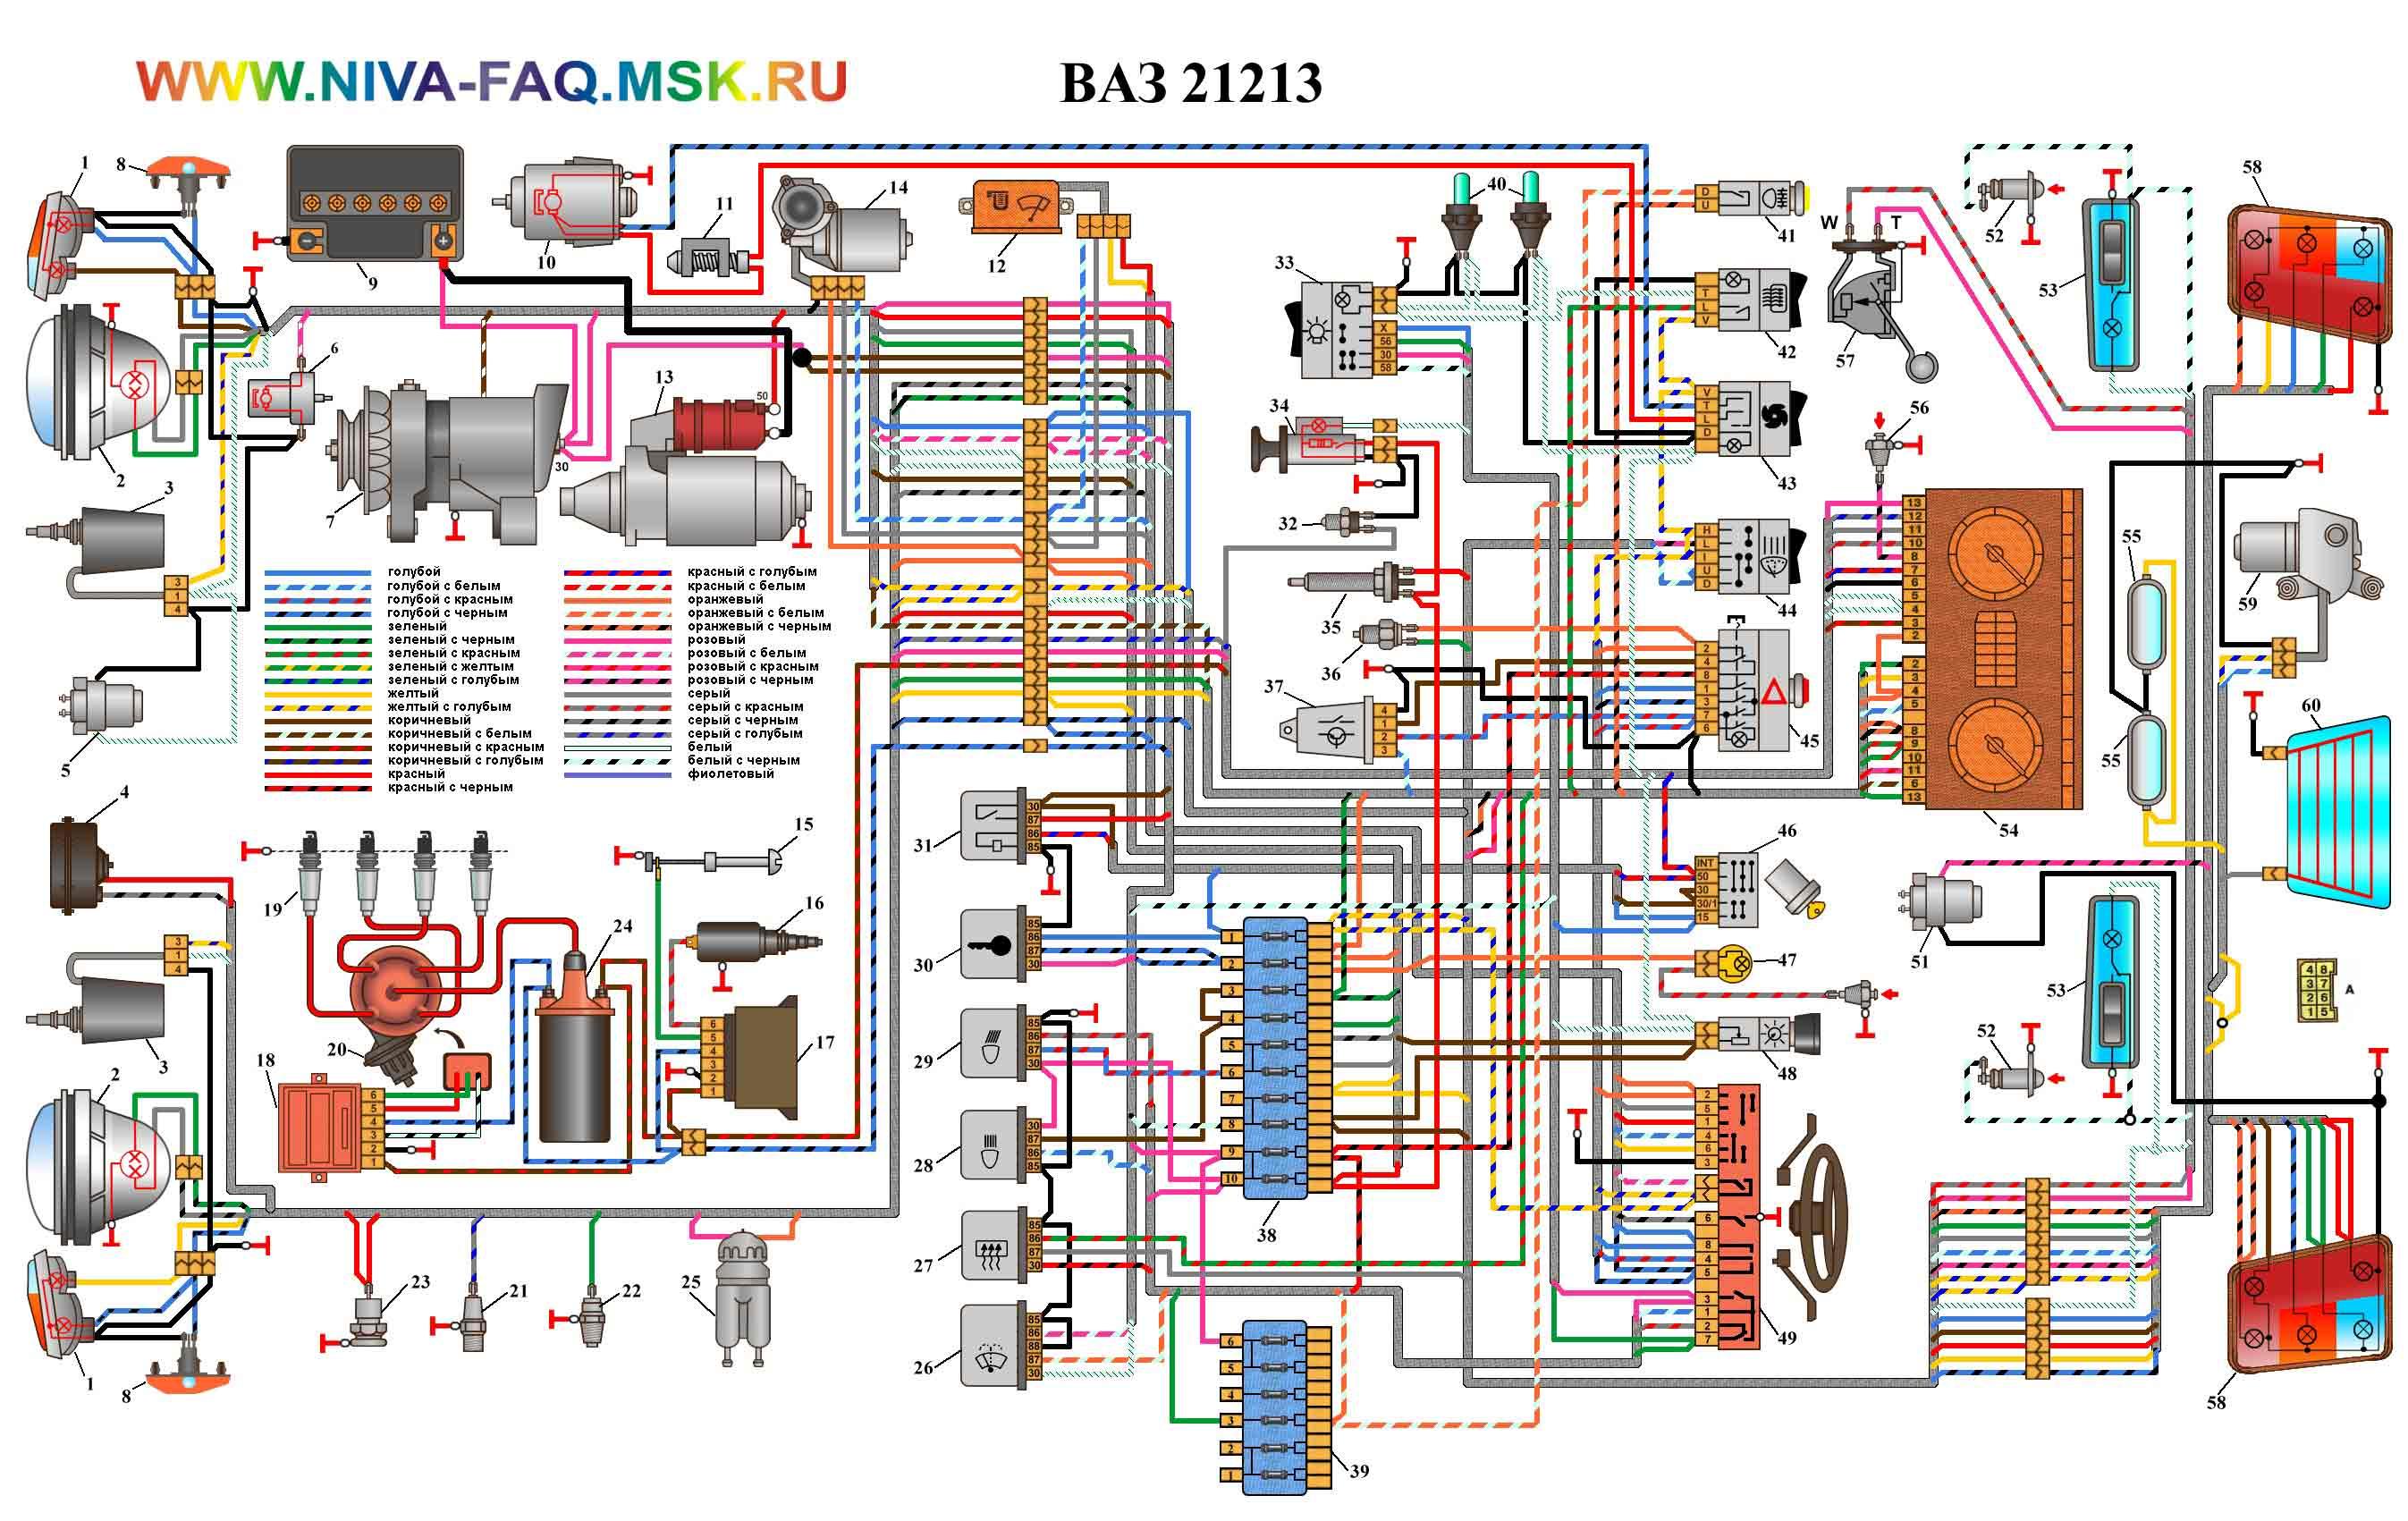 Электросхема ВАЗ 2121 - схема электрооборудования